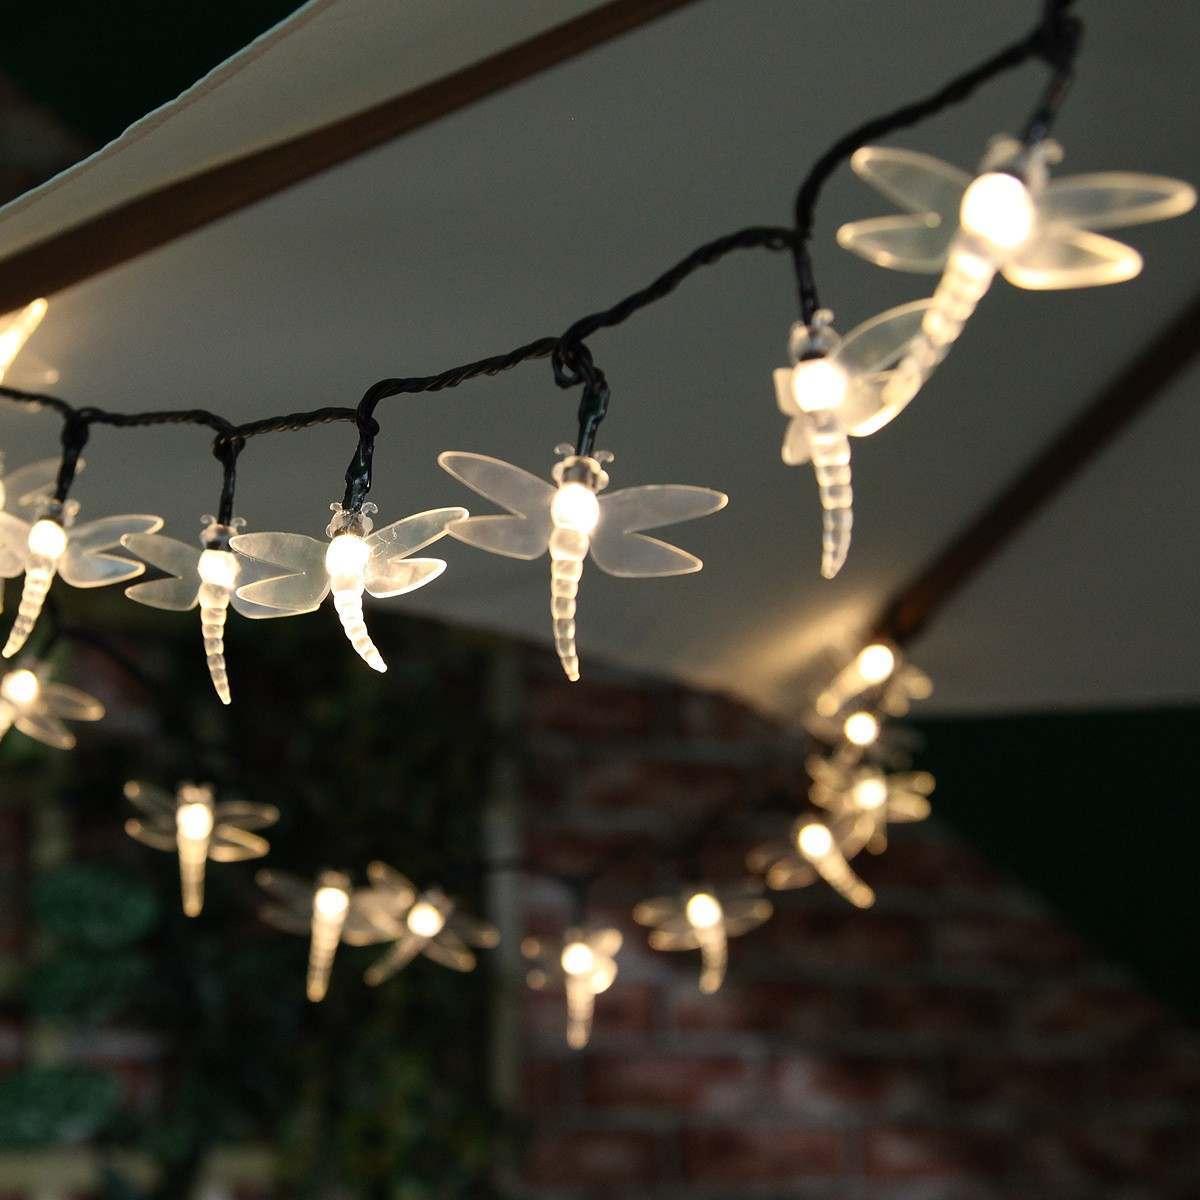 Solar Multi Function Dragonfly Christmas Fairy Lights 50 Warm White Leds 5m